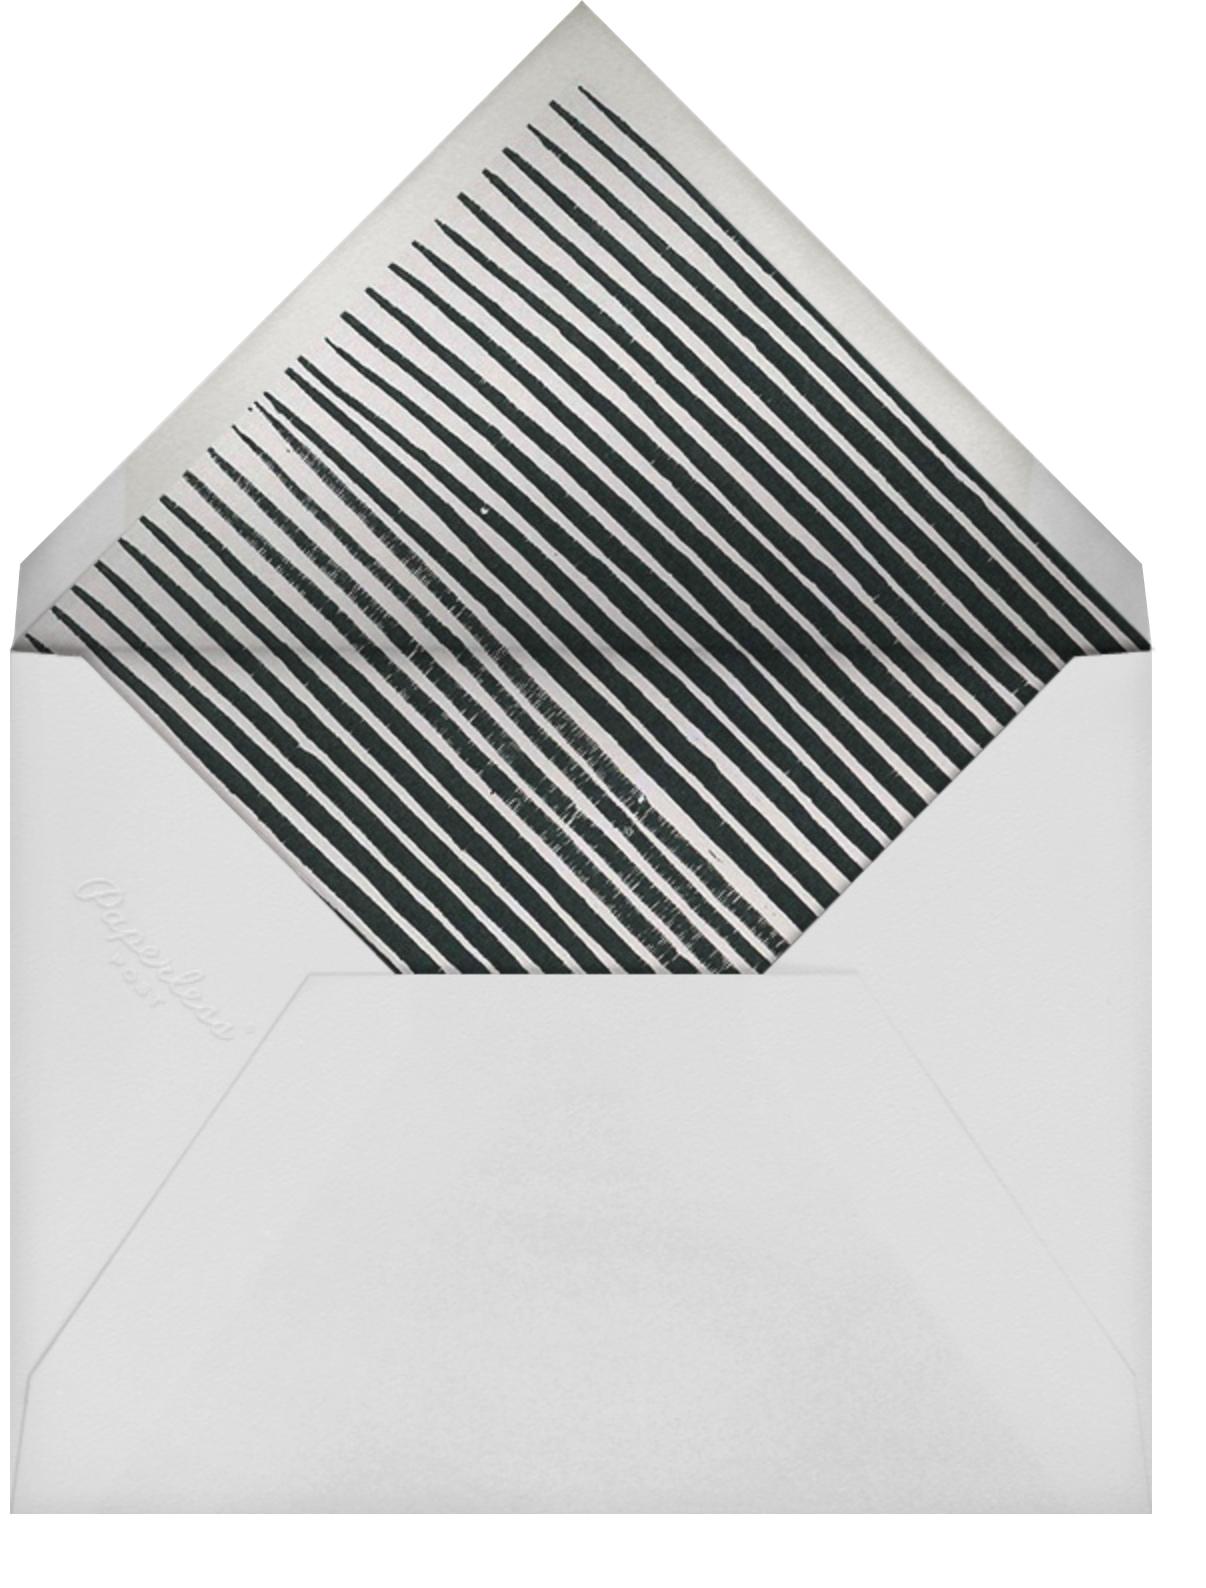 Fette (Stationery) - White/Gold - Kelly Wearstler - Personalized stationery - envelope back